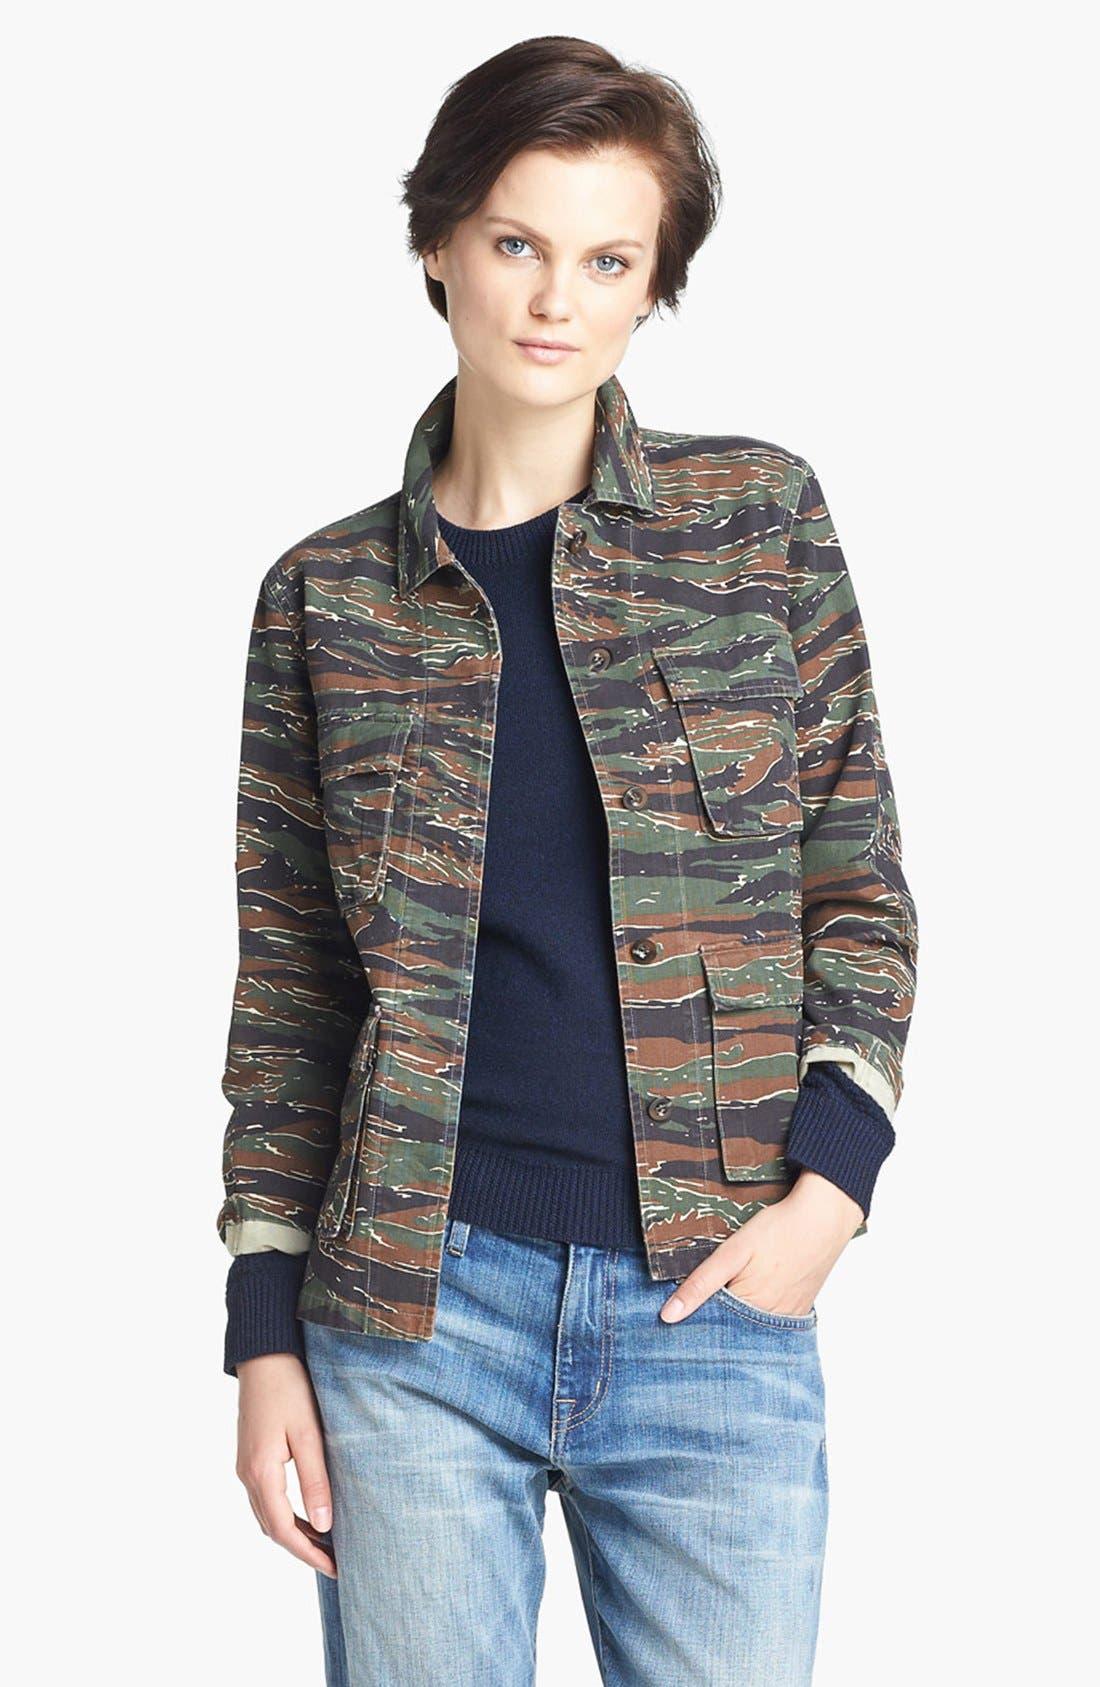 Alternate Image 1 Selected - A.P.C. Vintage Camouflage Jacket